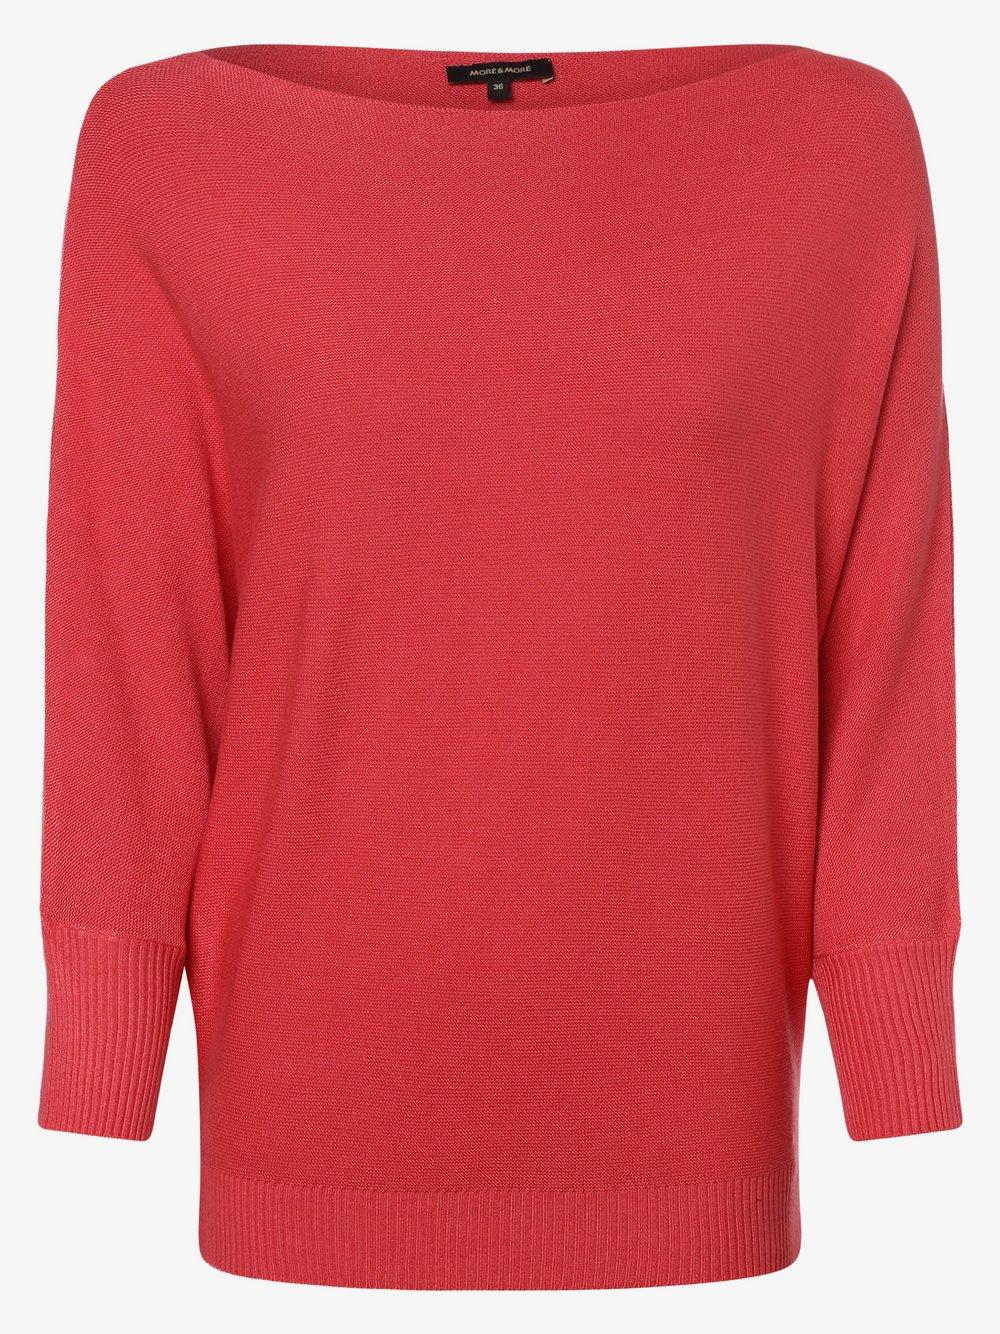 More & More - Sweter damski, czerwony